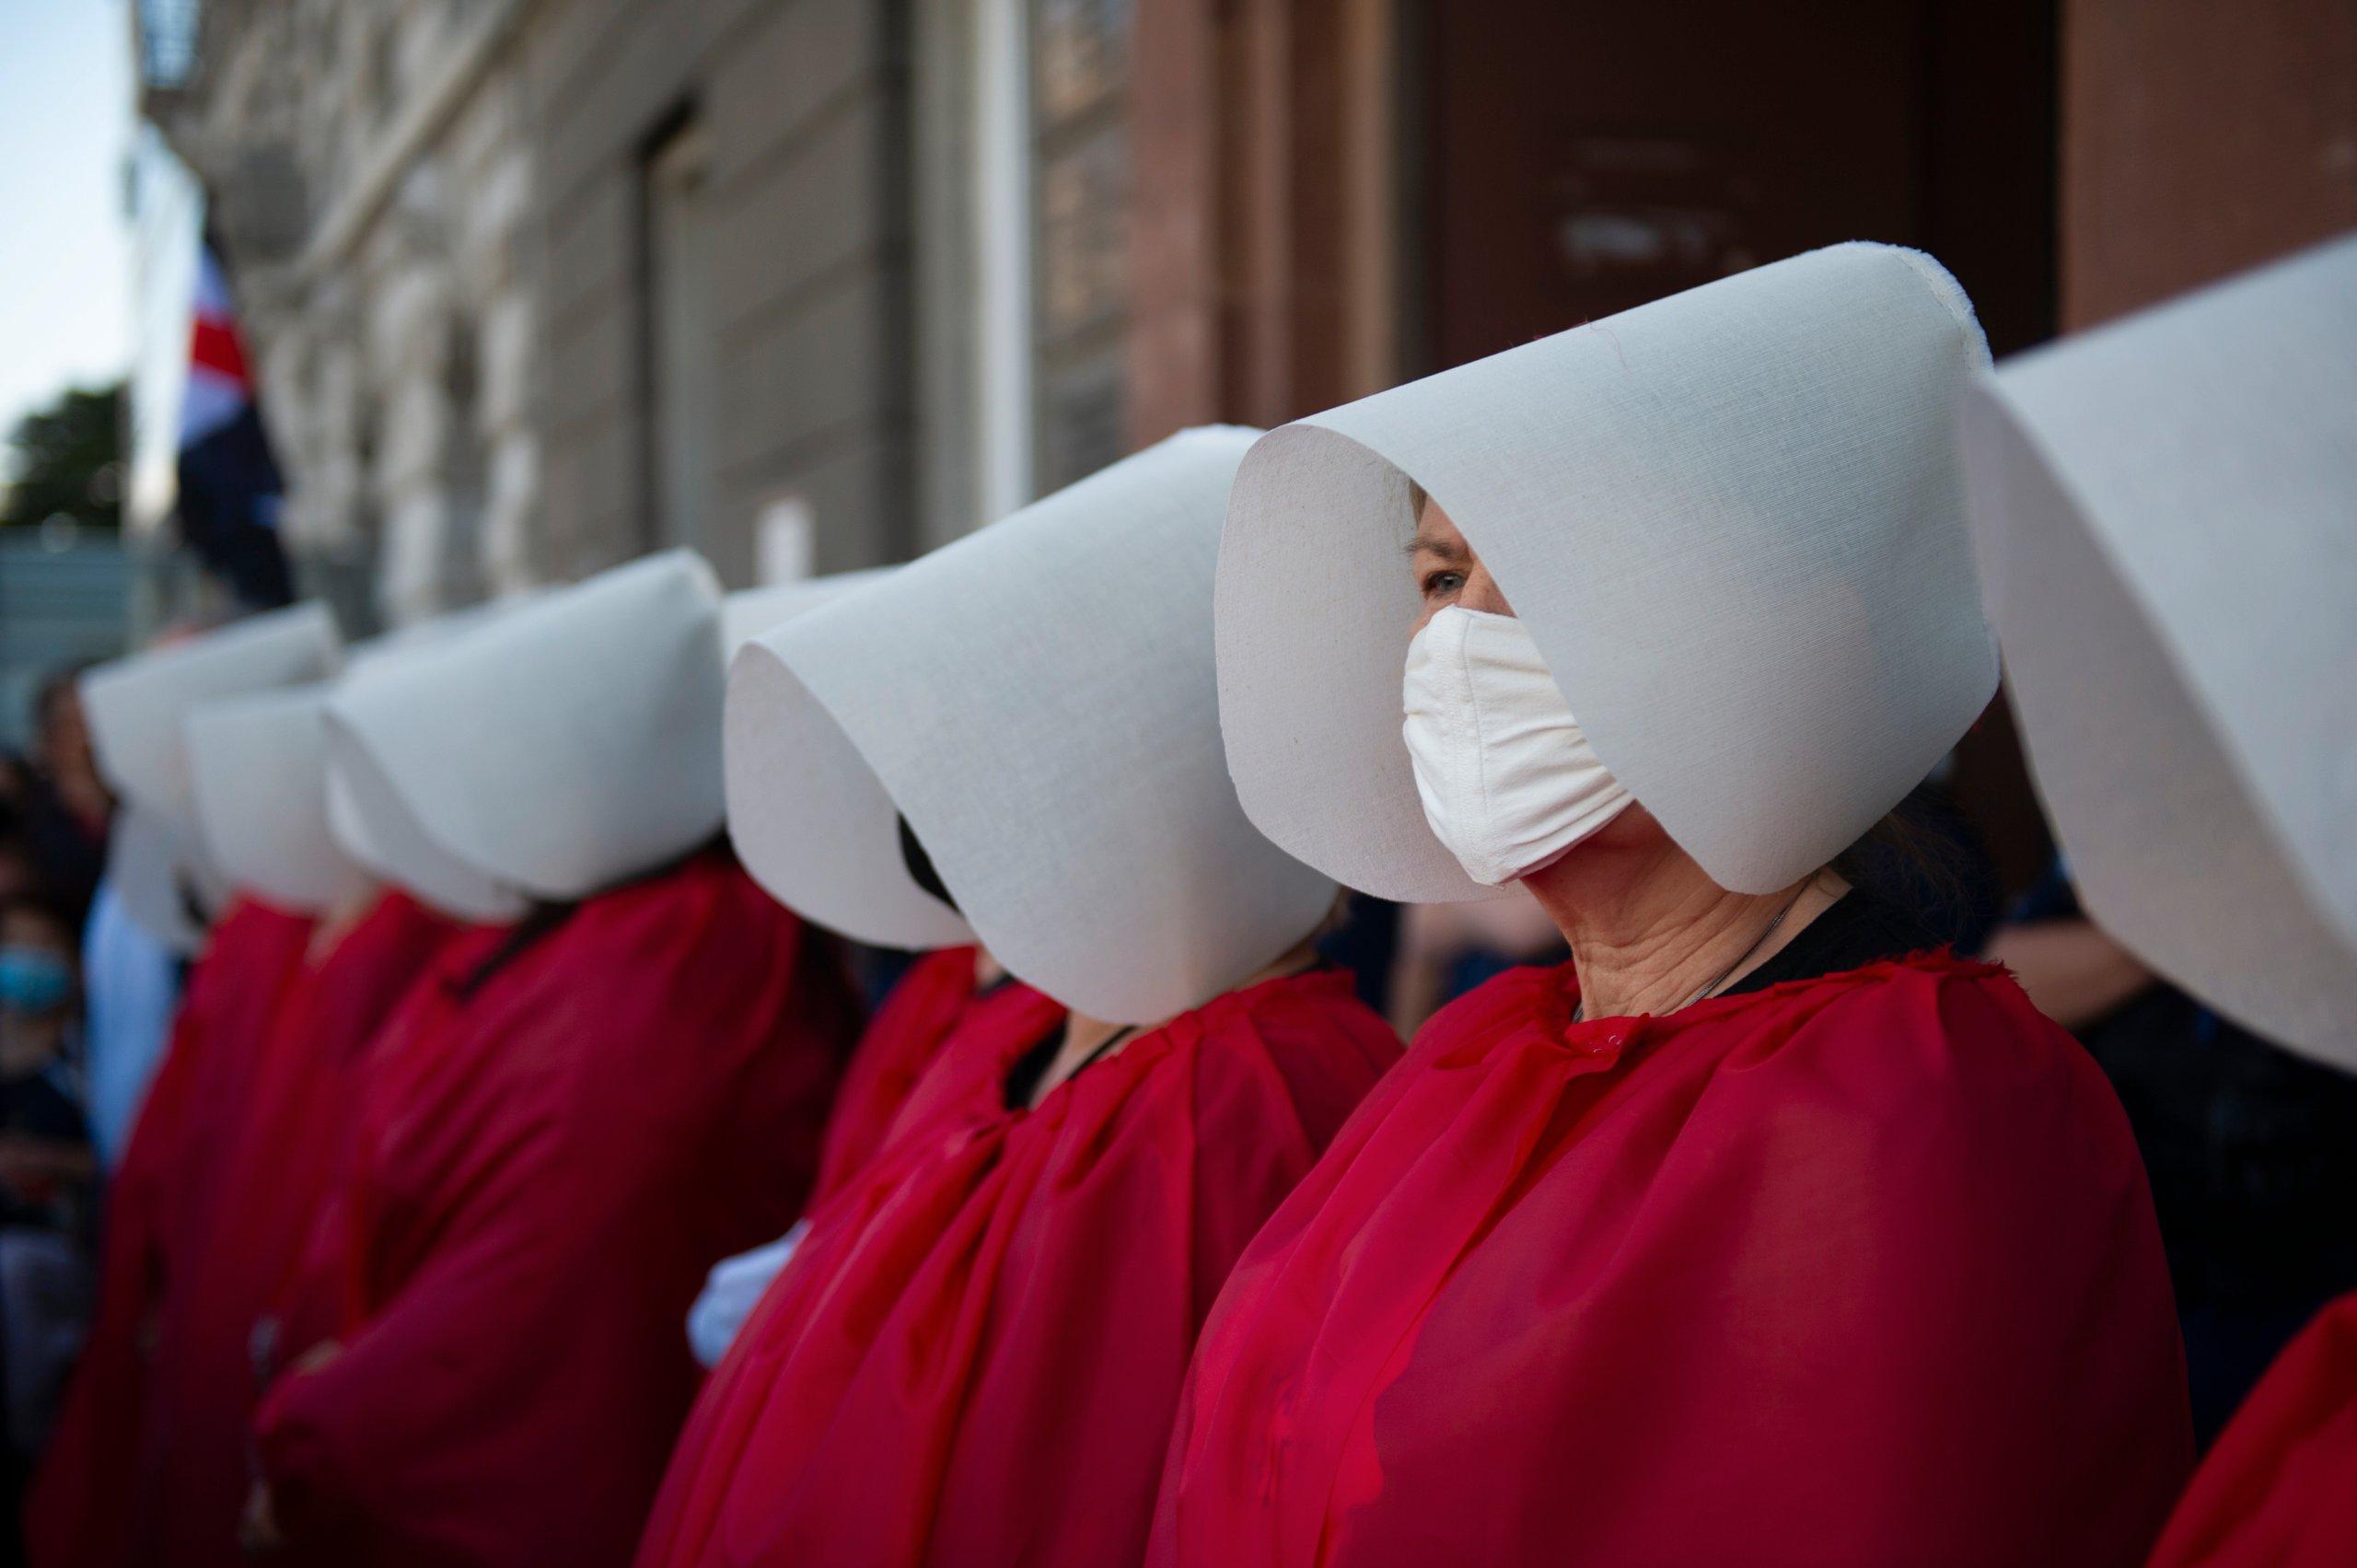 Anti-Domestic Violence Protest In Warsaw